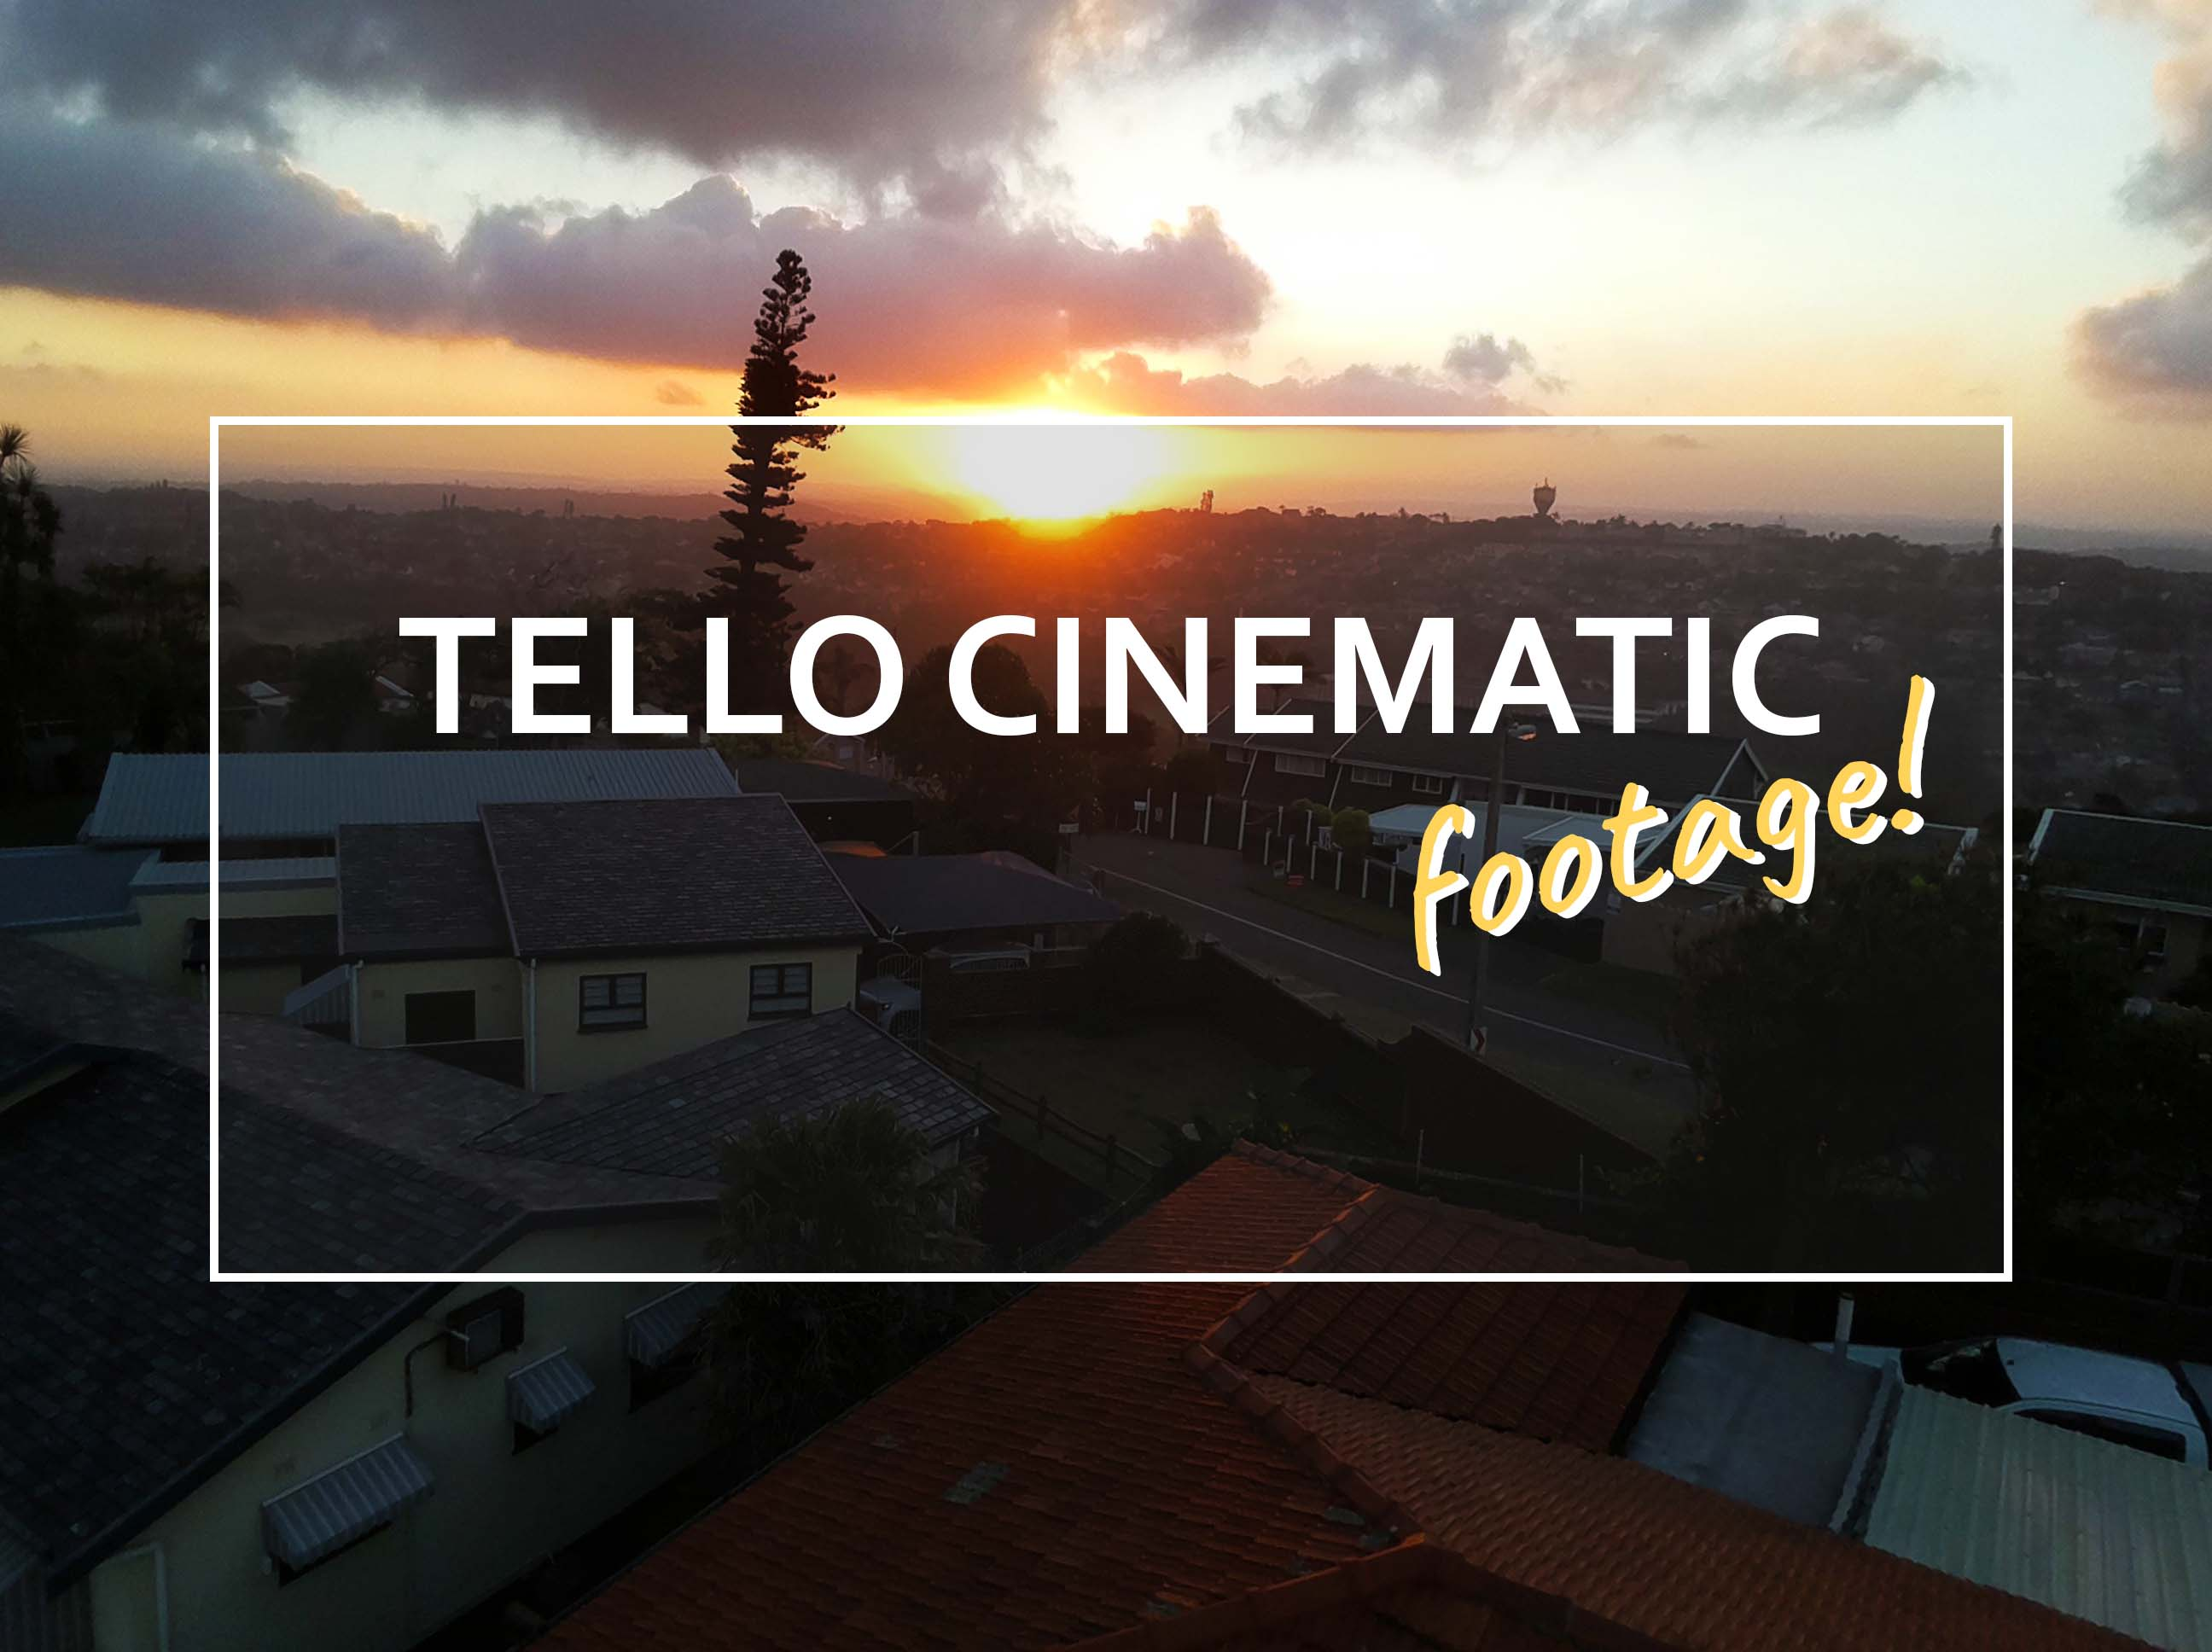 Tello Cinematic Footage: Best Videos - Dji Ryze Tello Fun Blog